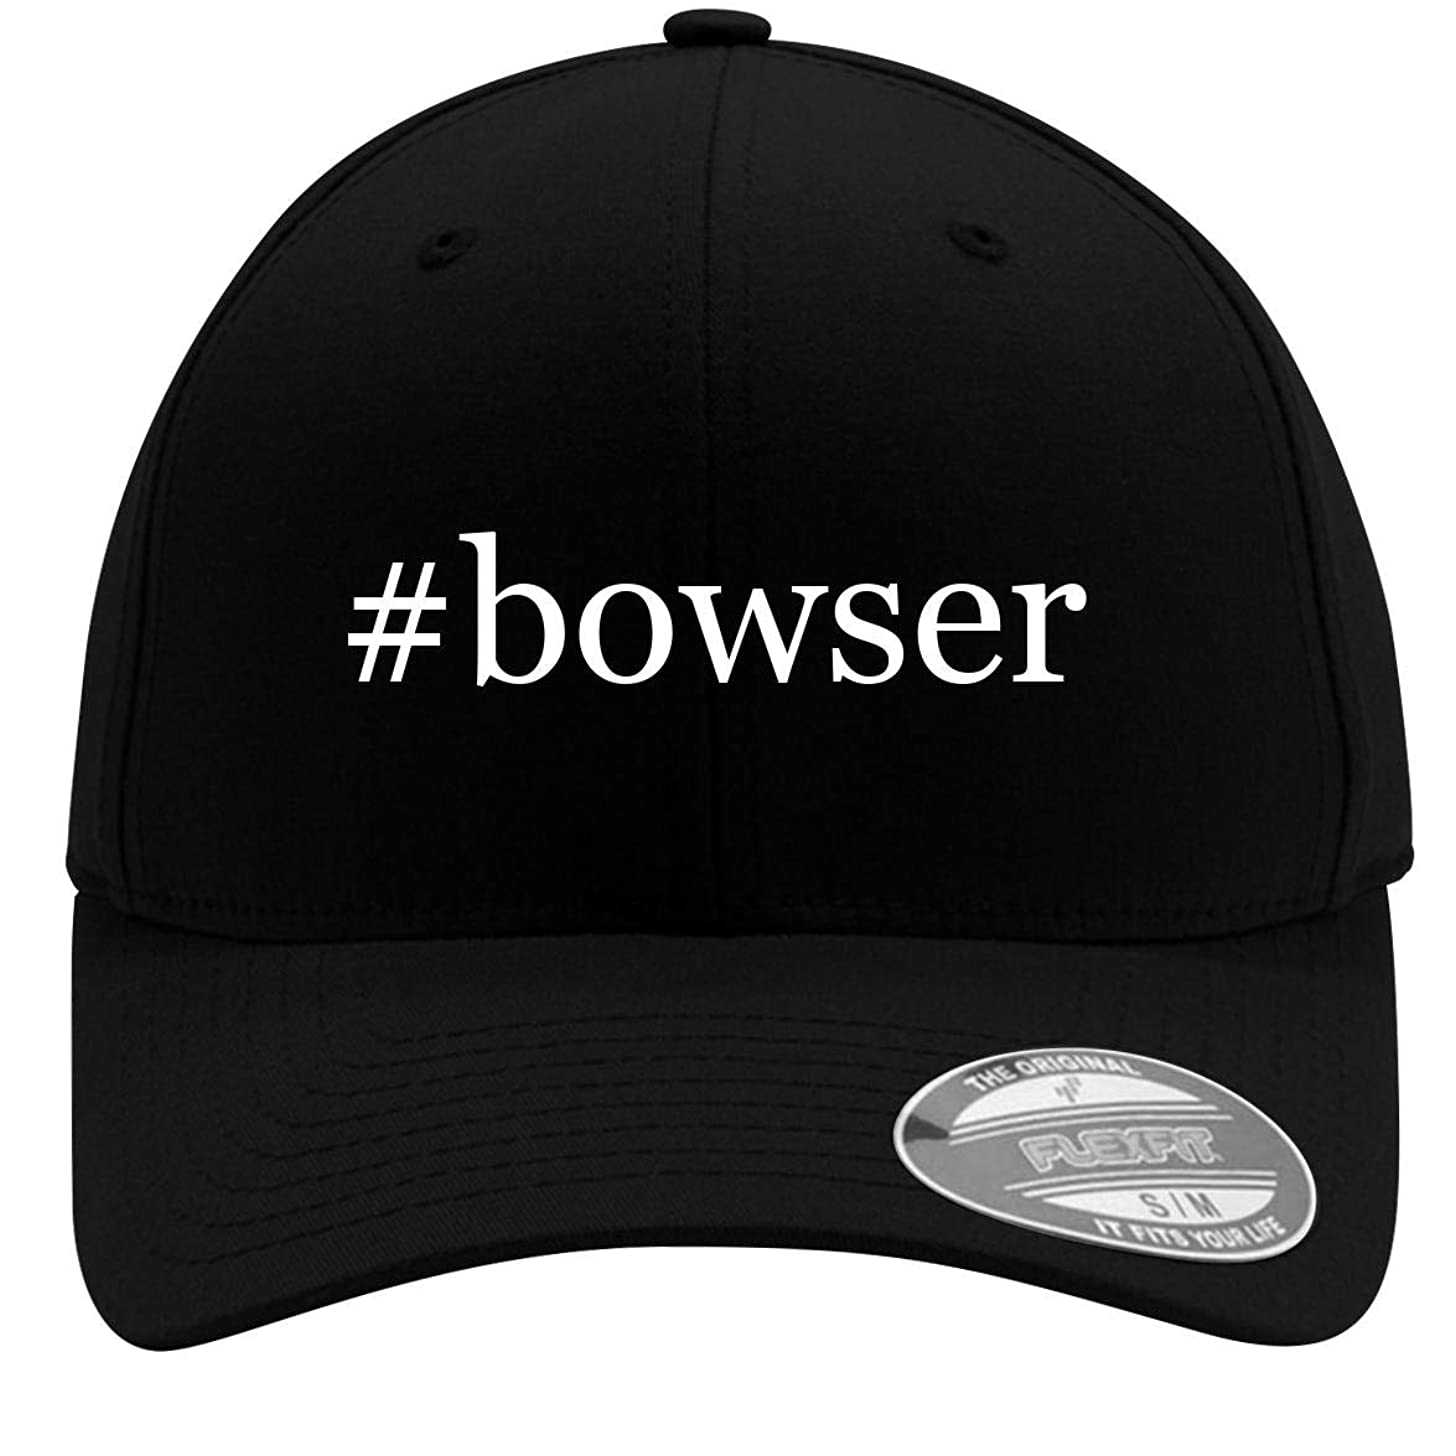 #Bowser - Adult Men's Hashtag Flexfit Baseball Hat Cap